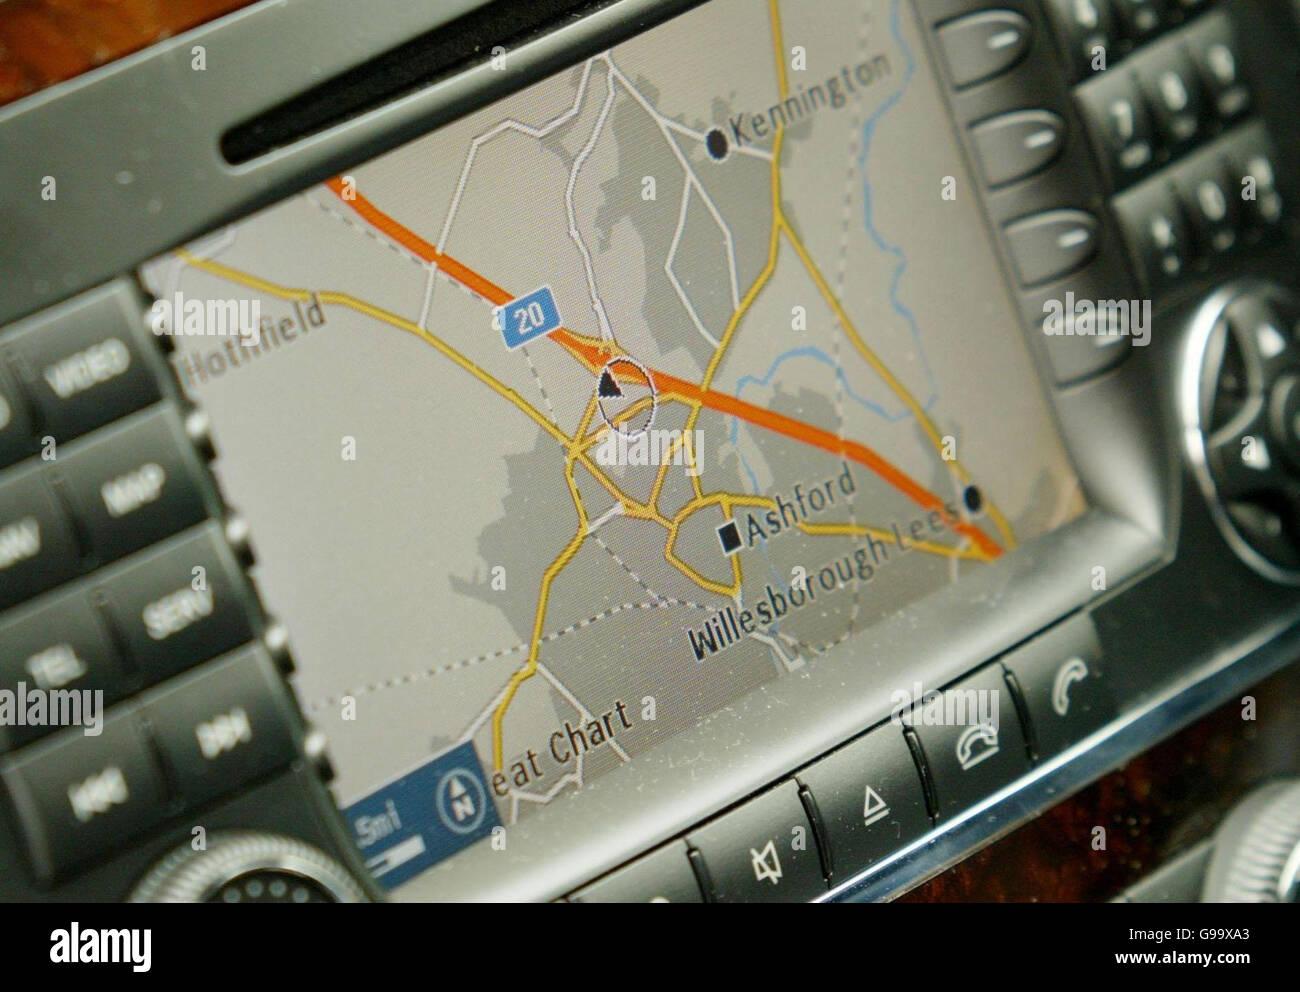 An built in satellite navigation system, sat nav in a car. - Stock Image